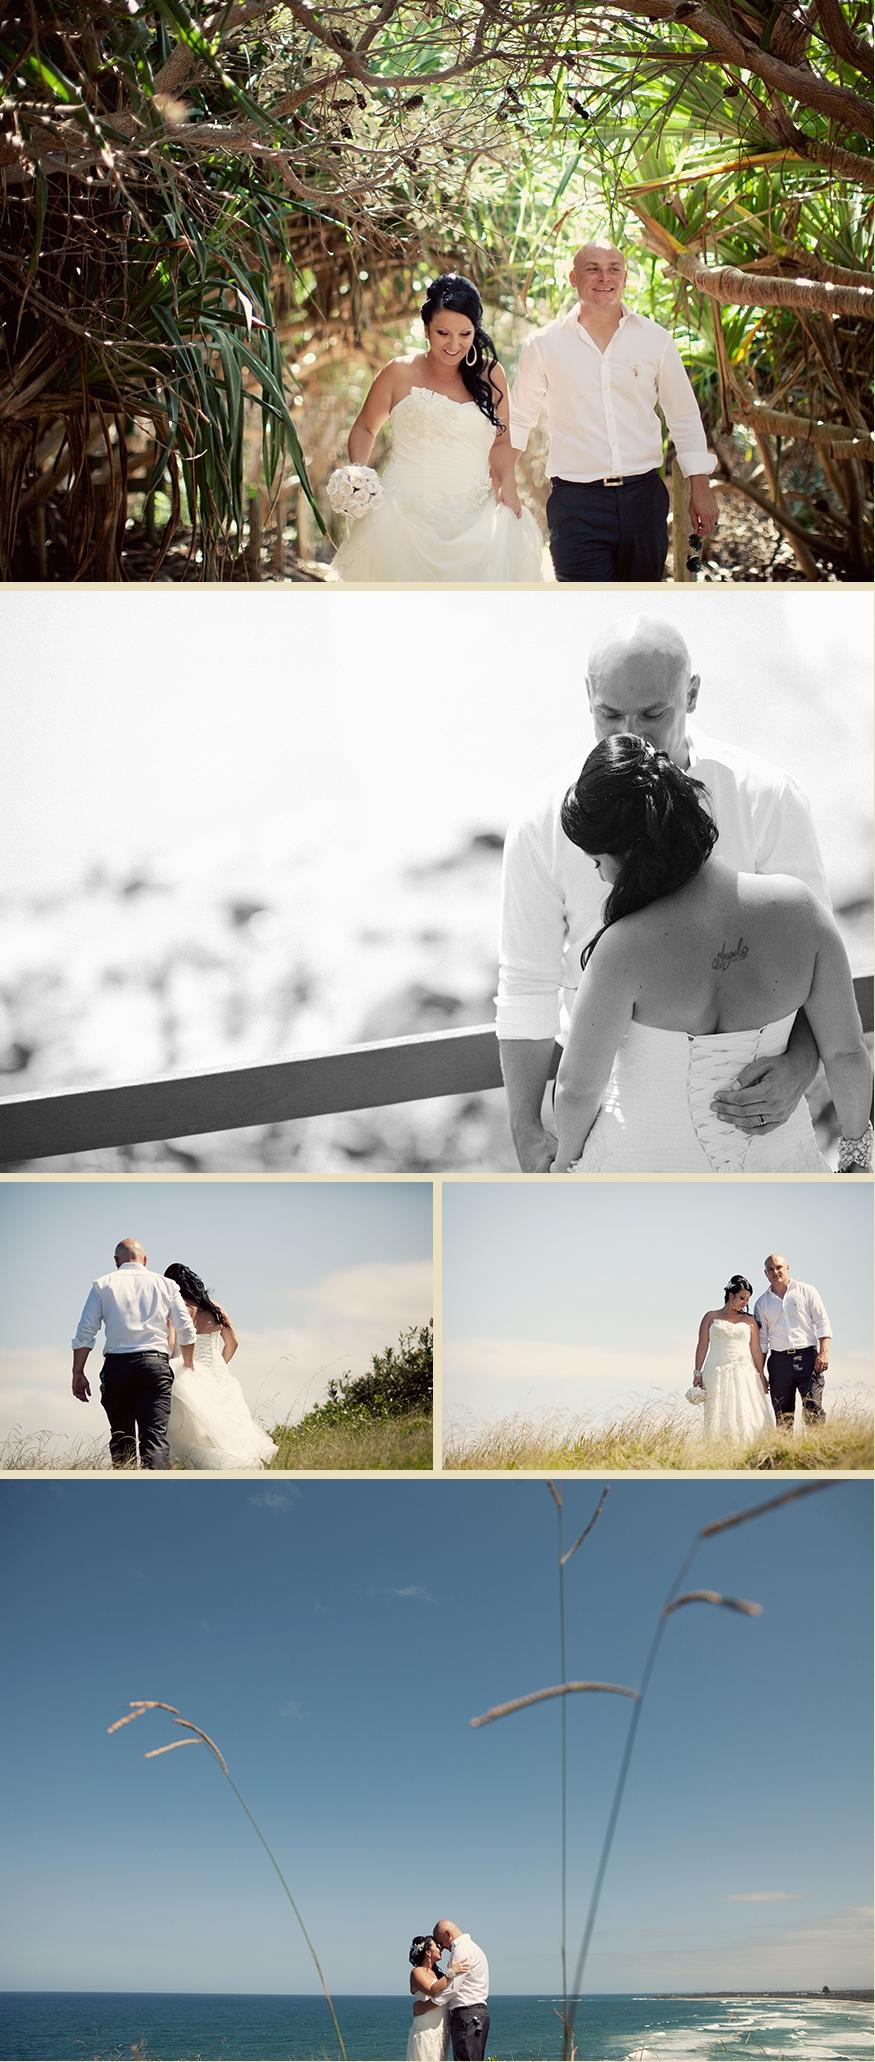 Brisbane Wedding Phoographer Blog collage-1329891411216